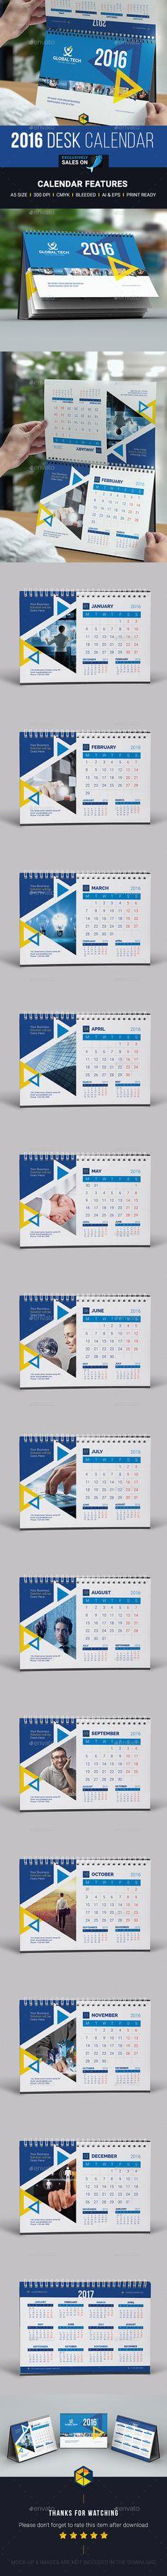 Desk Calendar 2016 Template Vector EPS, AI #design Download: http://graphicriver.net/item/desk-calendar-2016/13977218?ref=ksioks